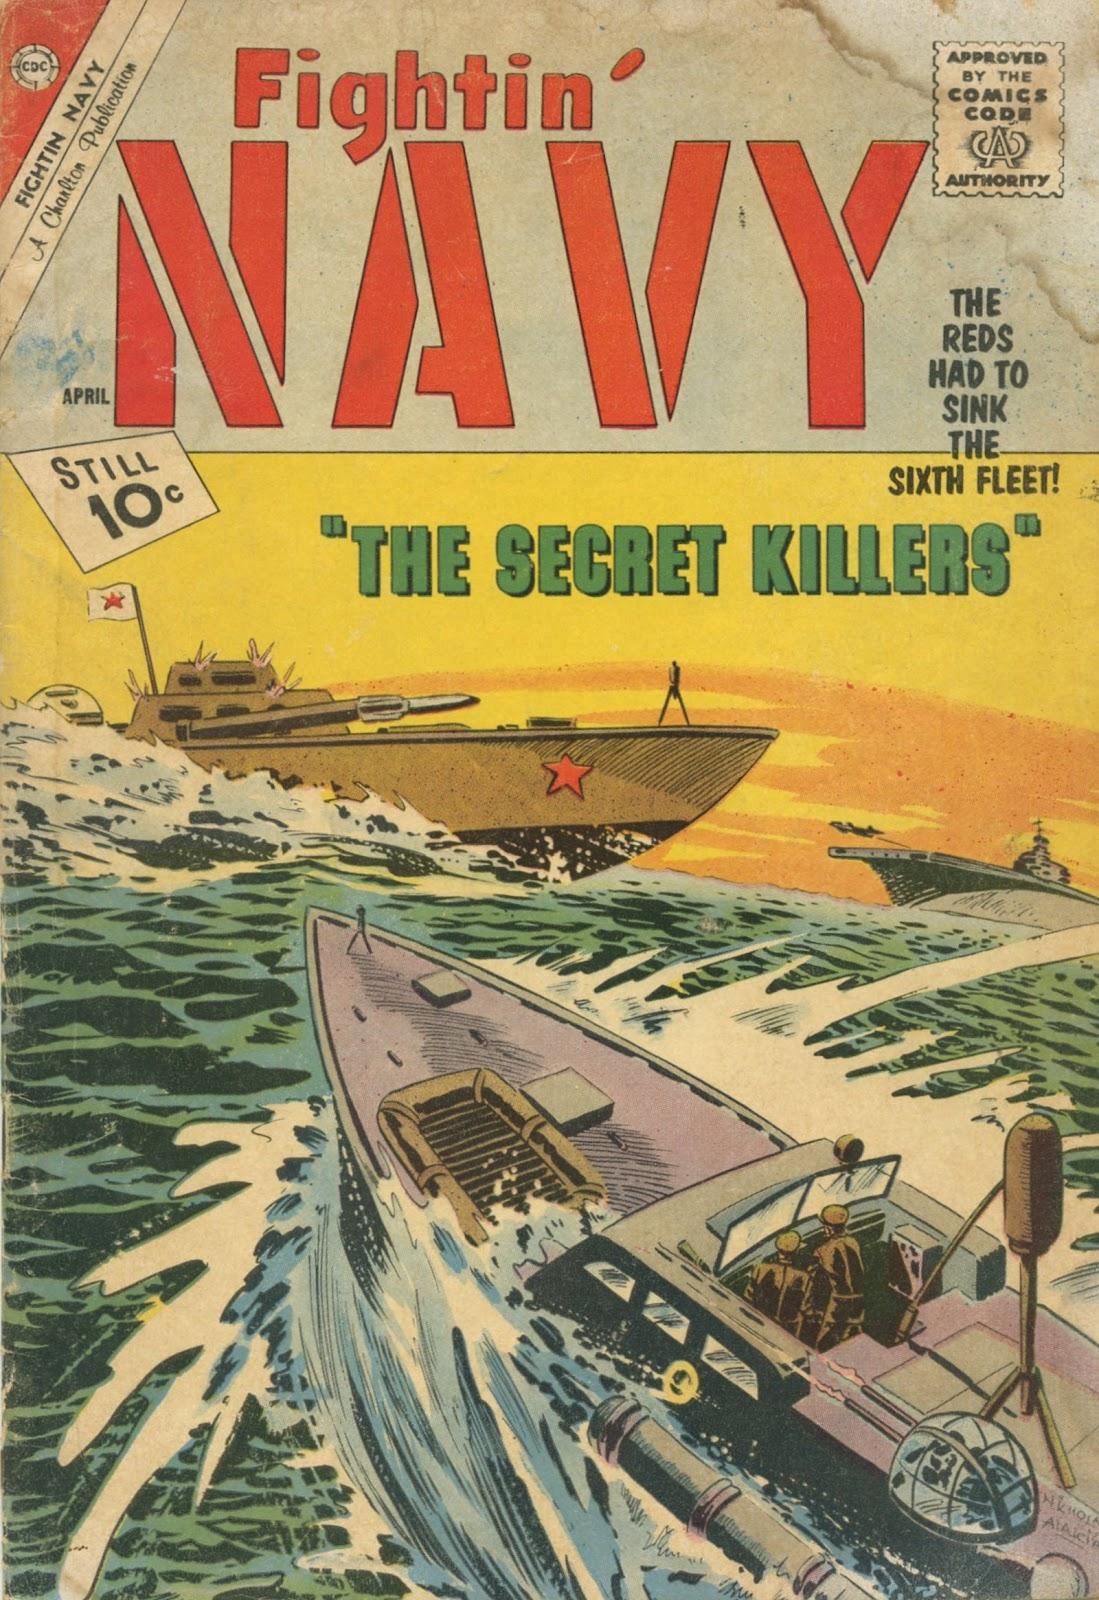 Read online Fightin' Navy comic -  Issue #103 - 1